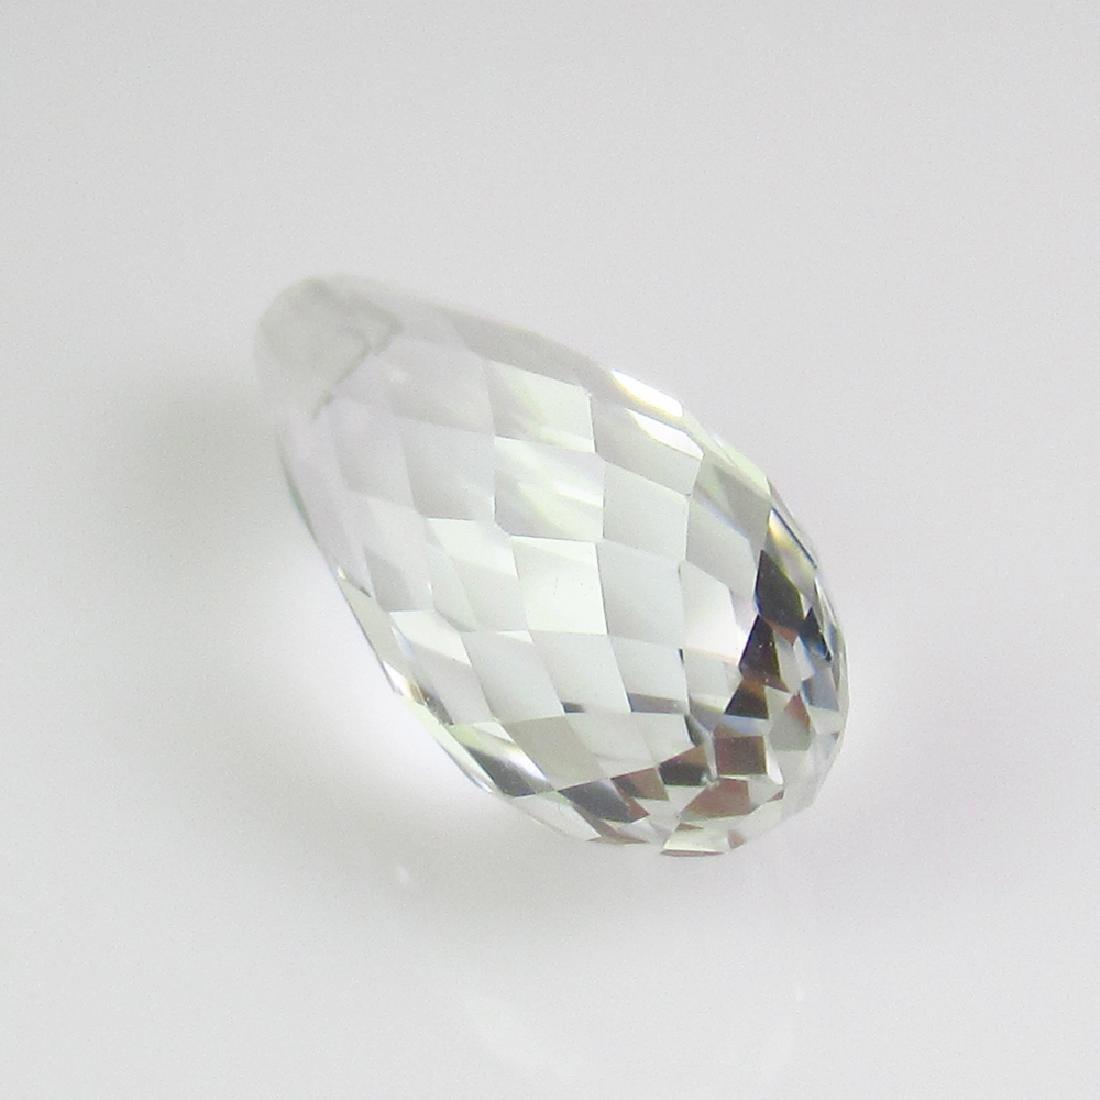 4.24 Ct Genuine White Topaz Drilled Pear Drop